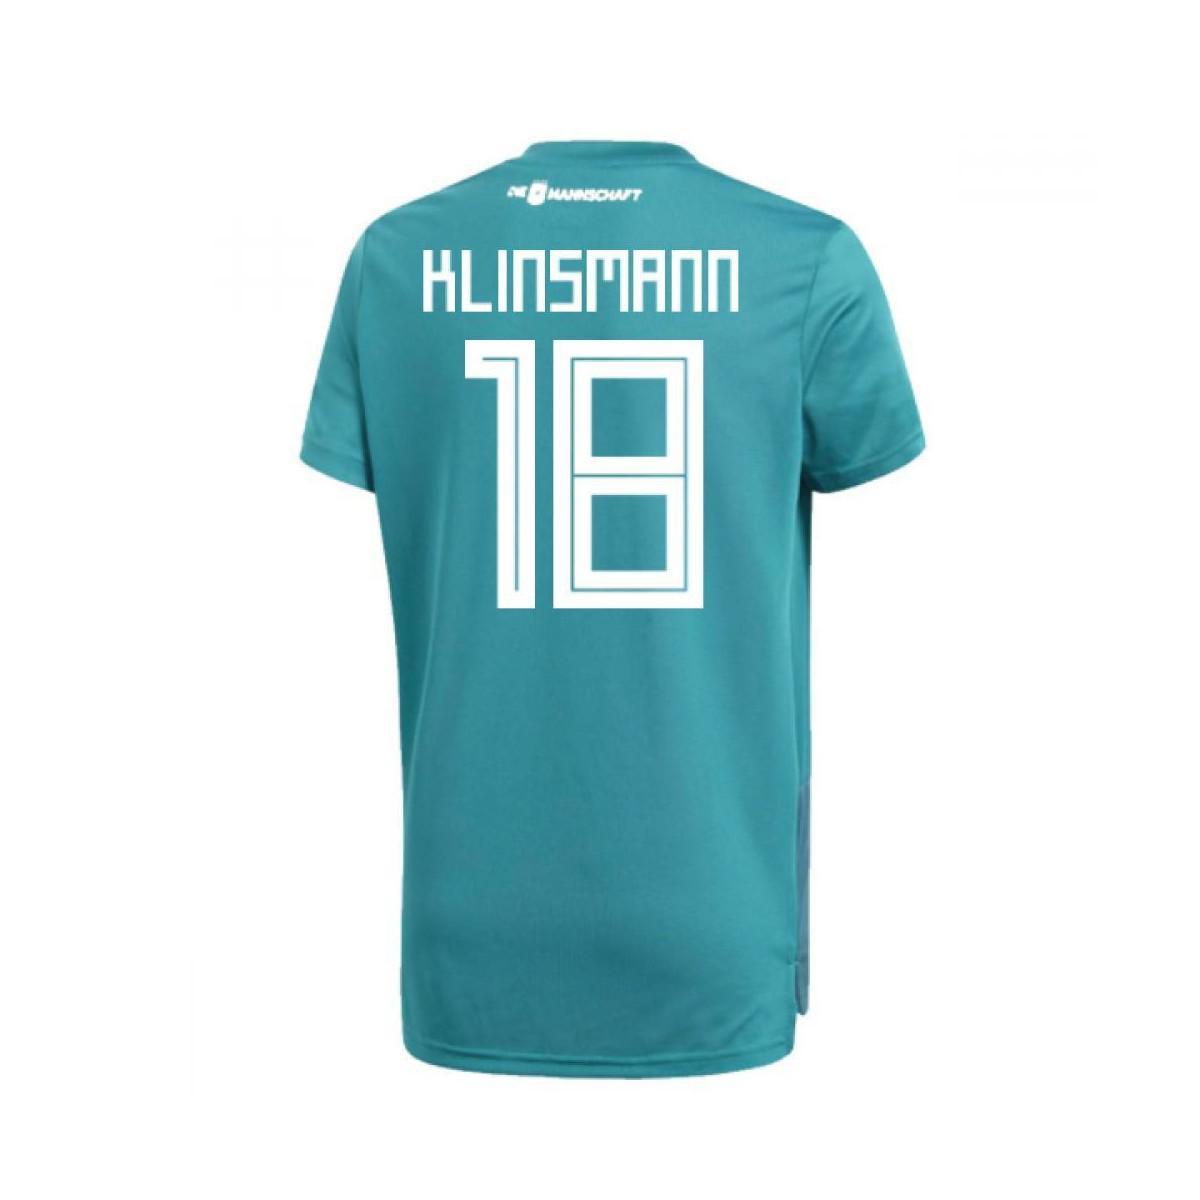 77d63378c adidas 2018-19 Germany Away Training Shirt (klinsmann 18) Men s T ...